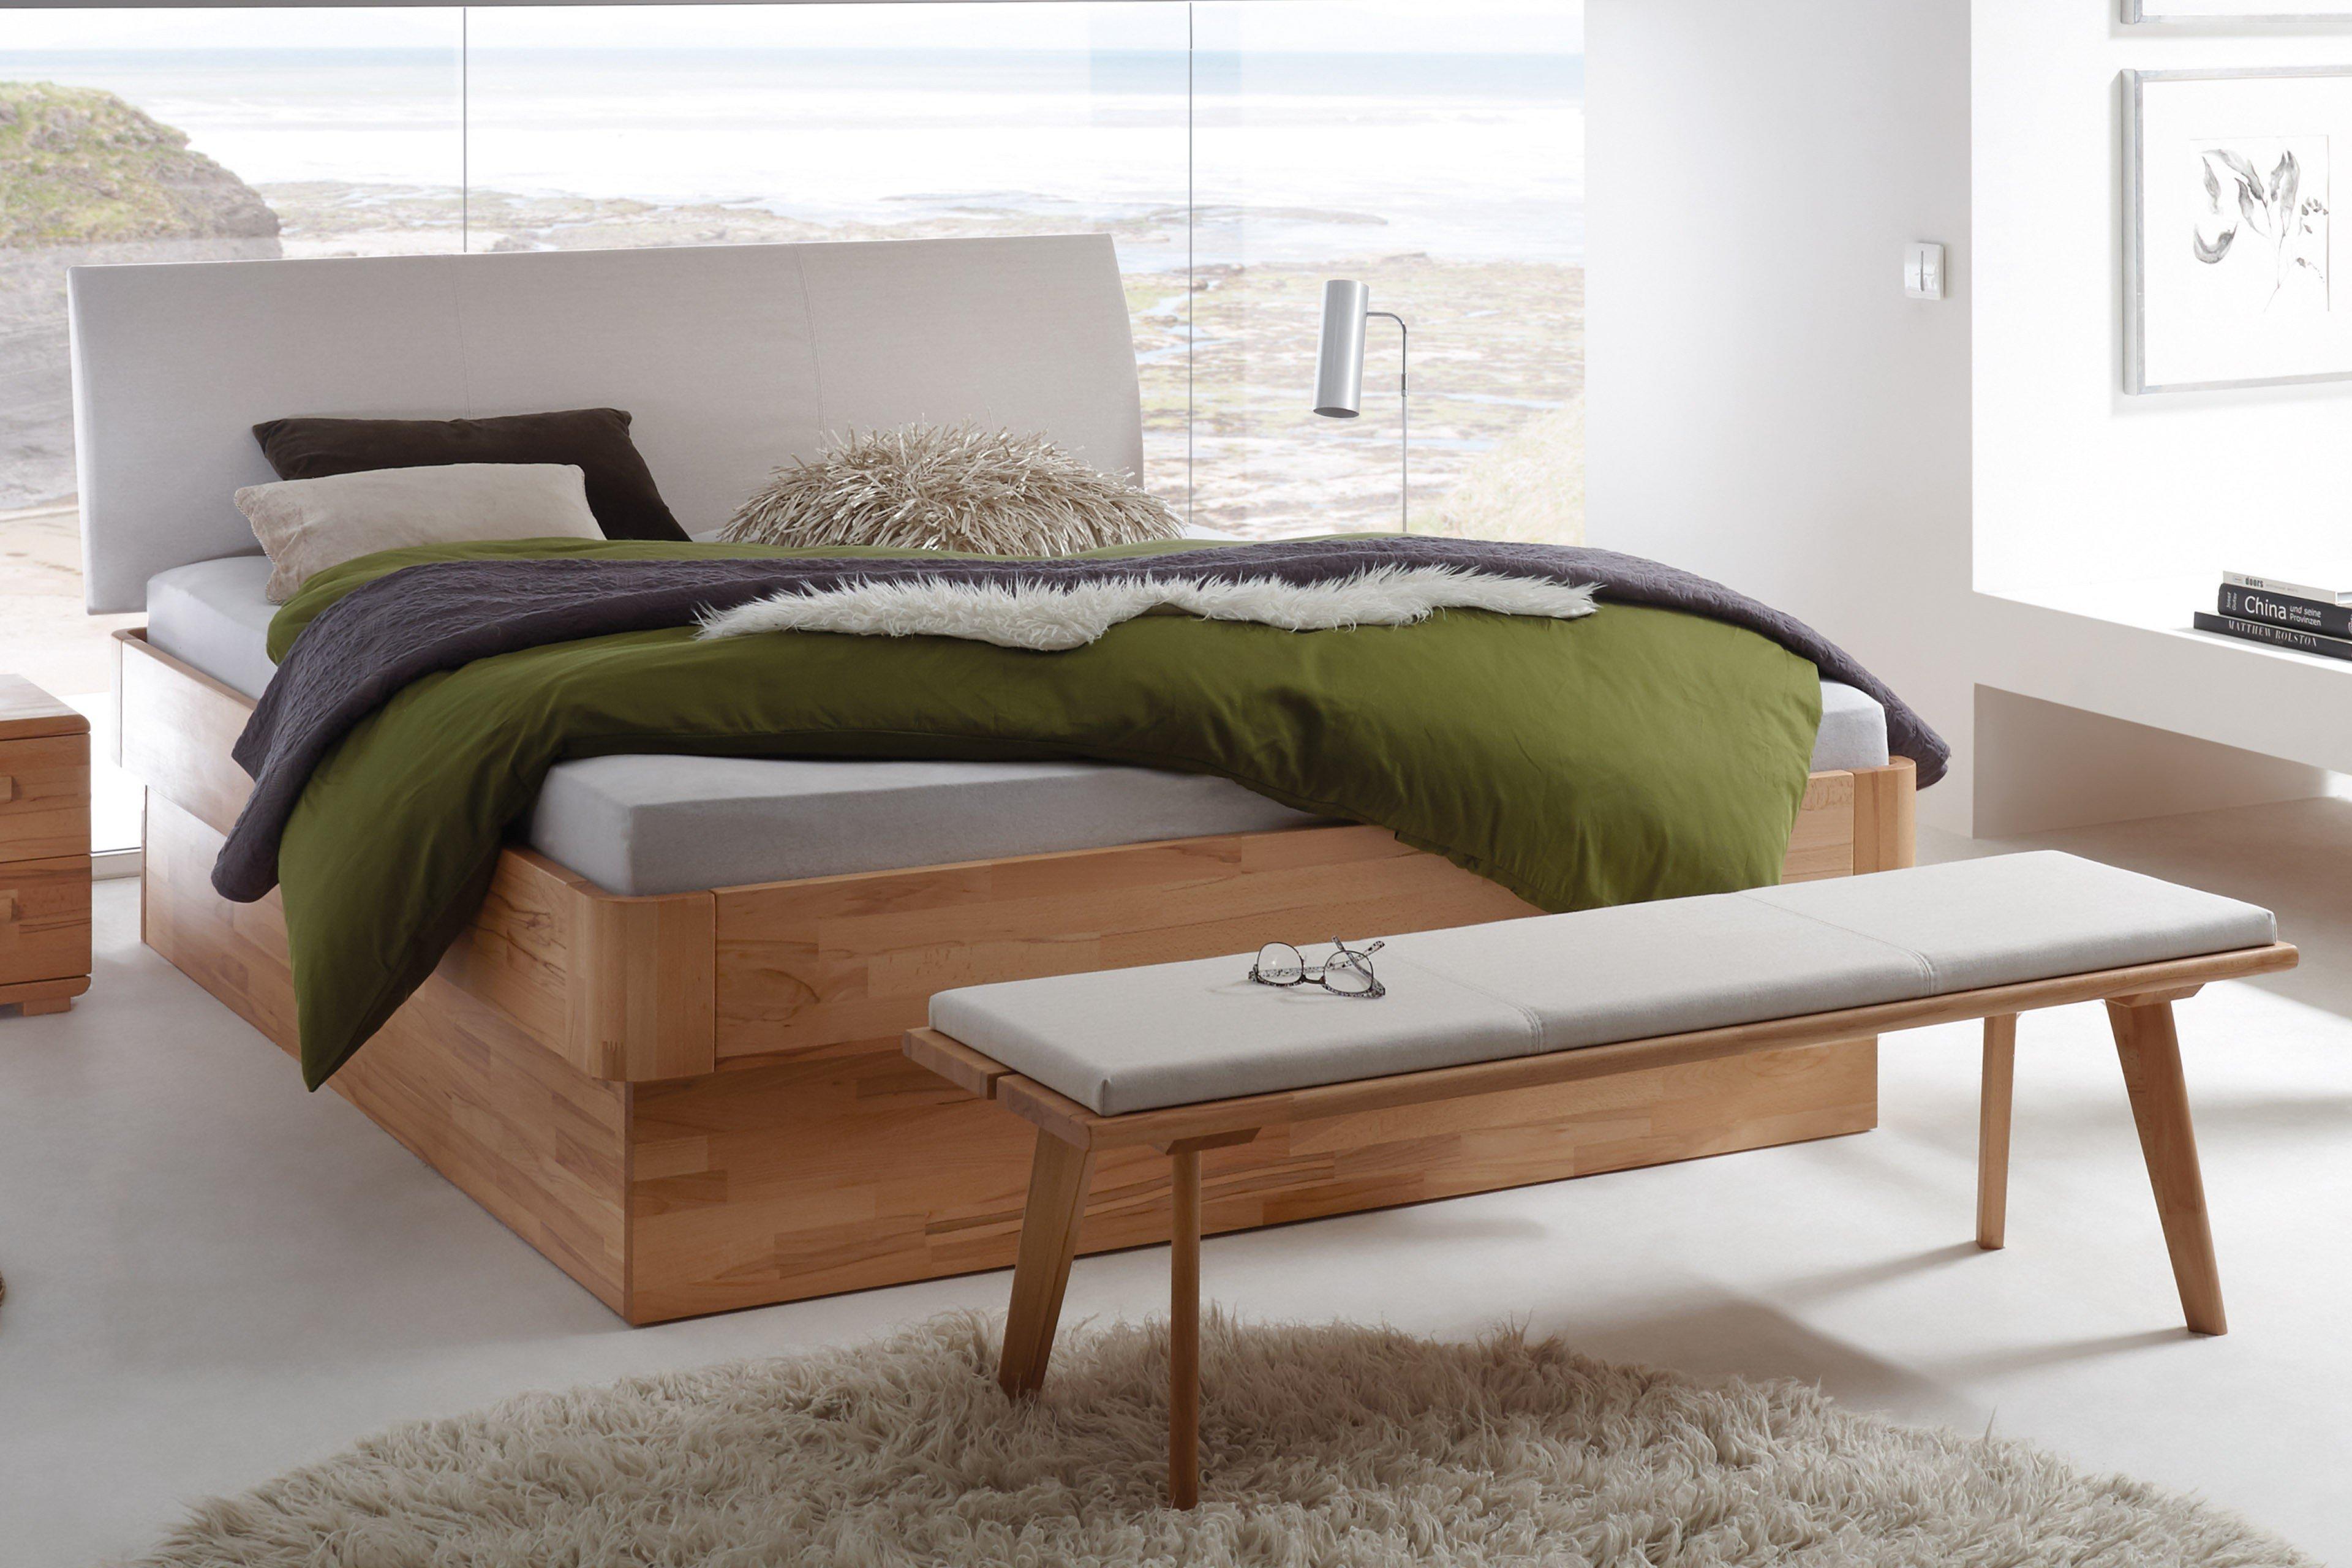 beste land holz bettrahmen galerie bilderrahmen ideen. Black Bedroom Furniture Sets. Home Design Ideas